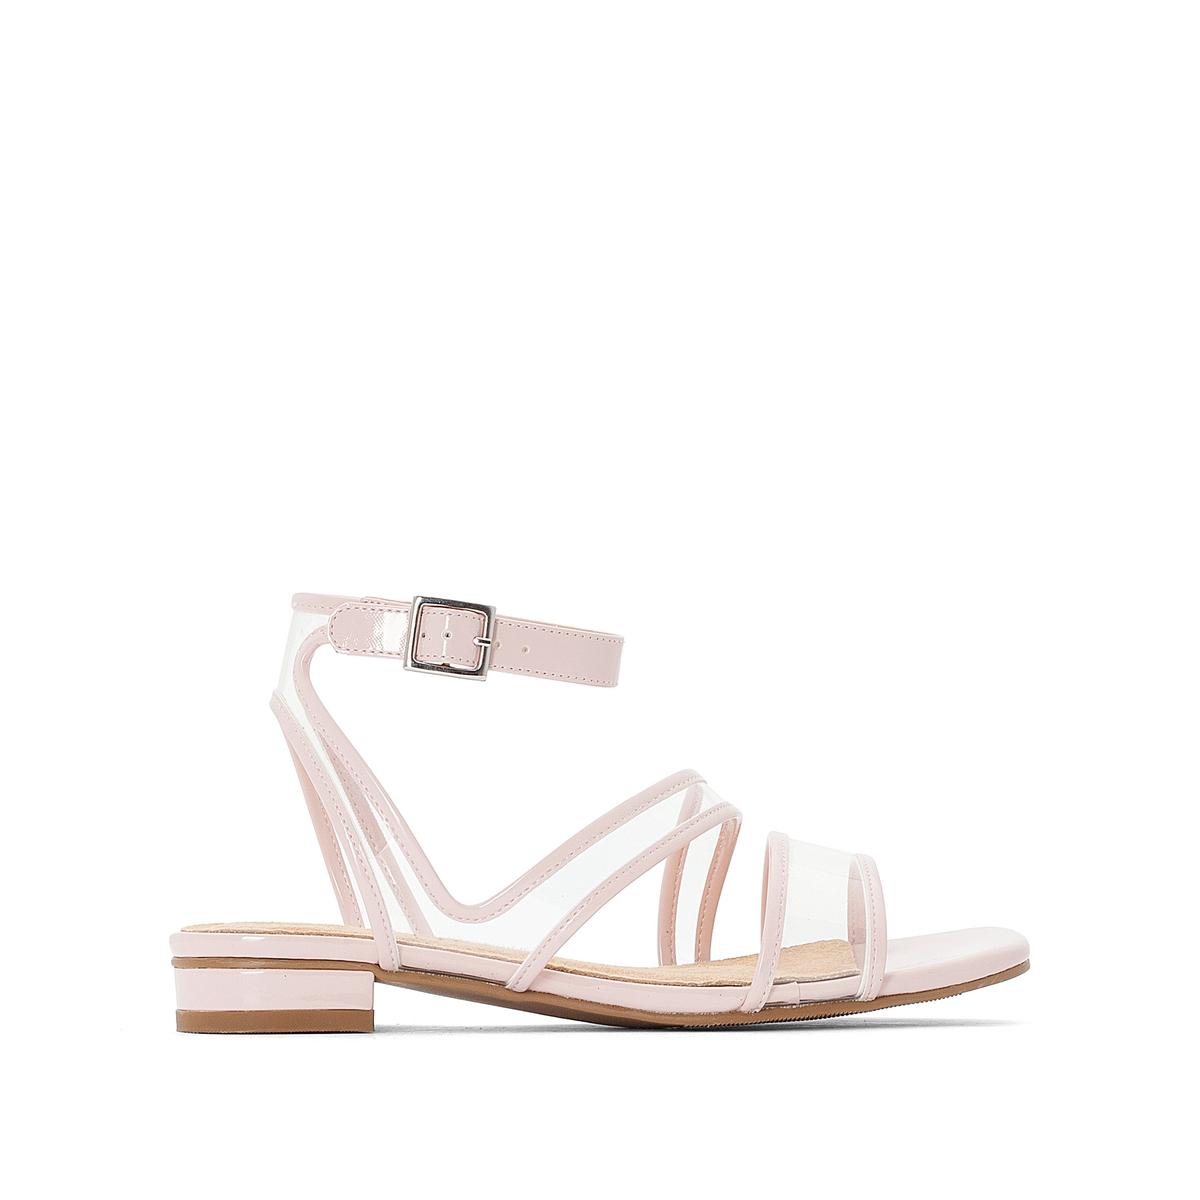 Босоножки La Redoute На плоском каблуке с прозрачными ремешками 37 розовый